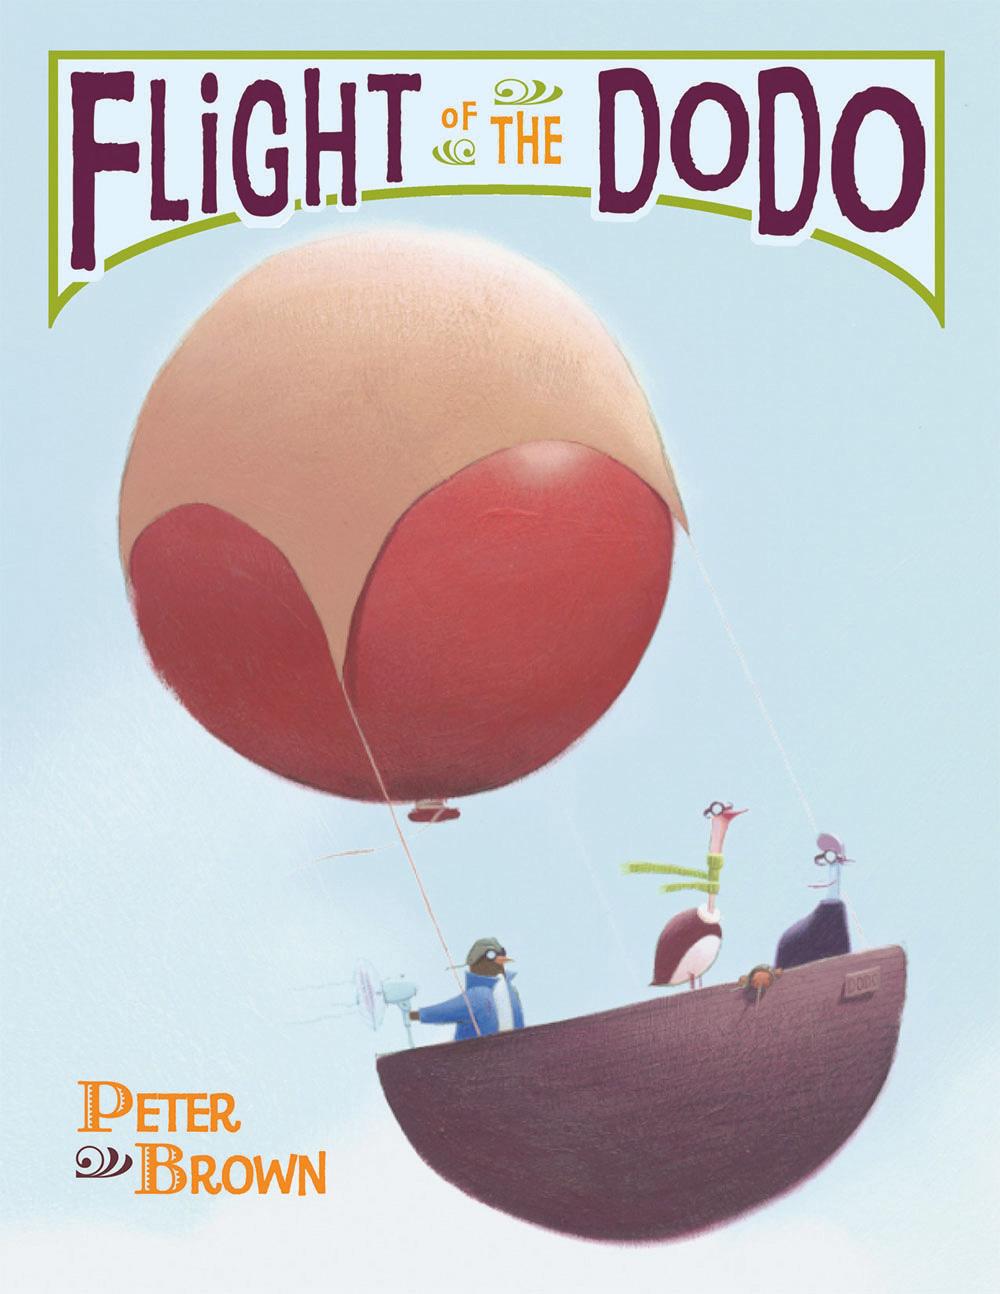 Brown, Peter 2005_10 - FLIGHT OF THE DODO - PB - RLM PR.jpg